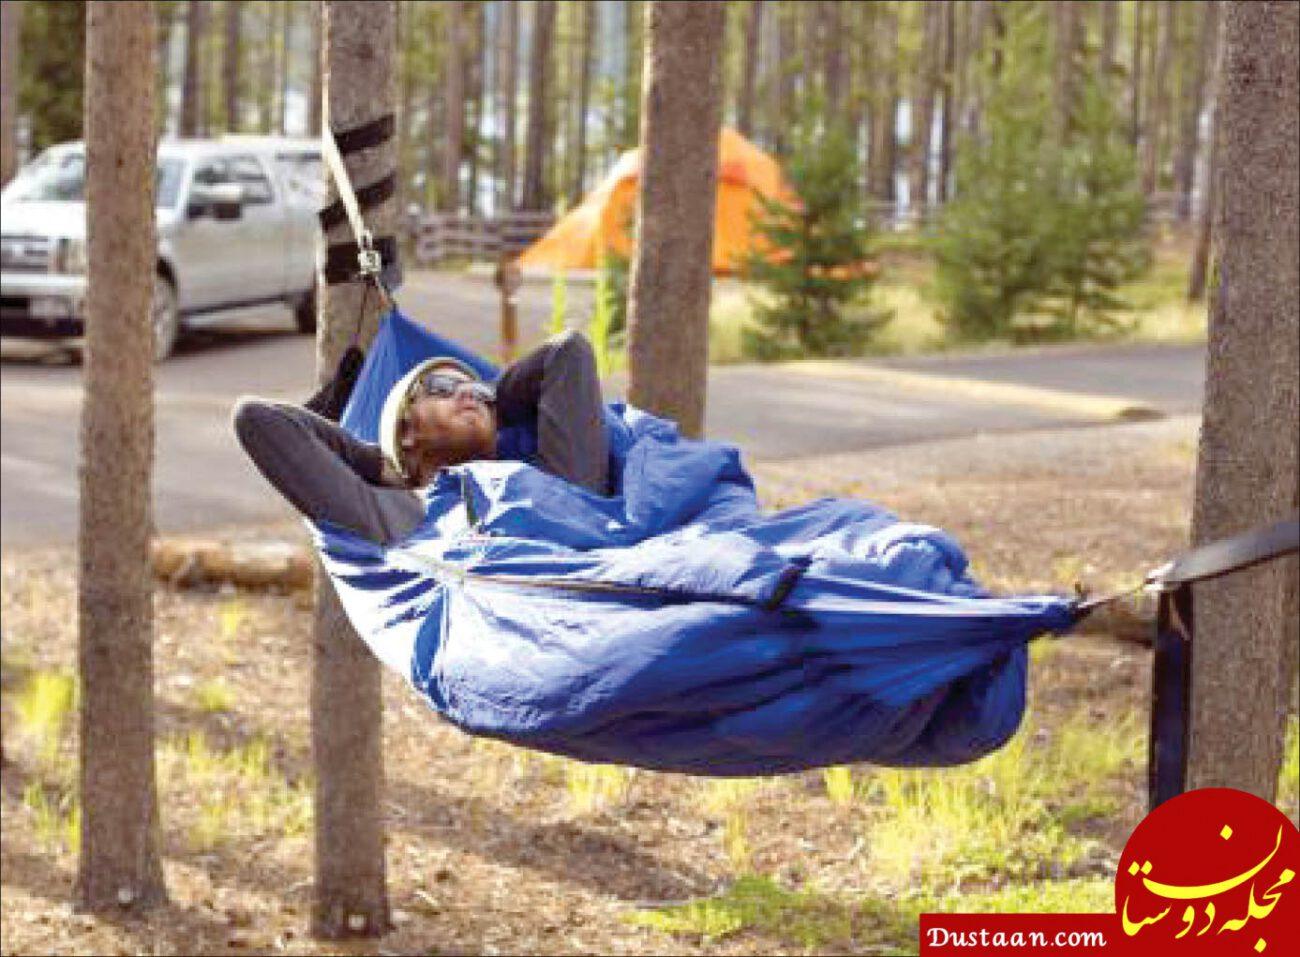 www.dustaan.com فواید خوابیدن درفضای باز بر حفظ سلامت بدن